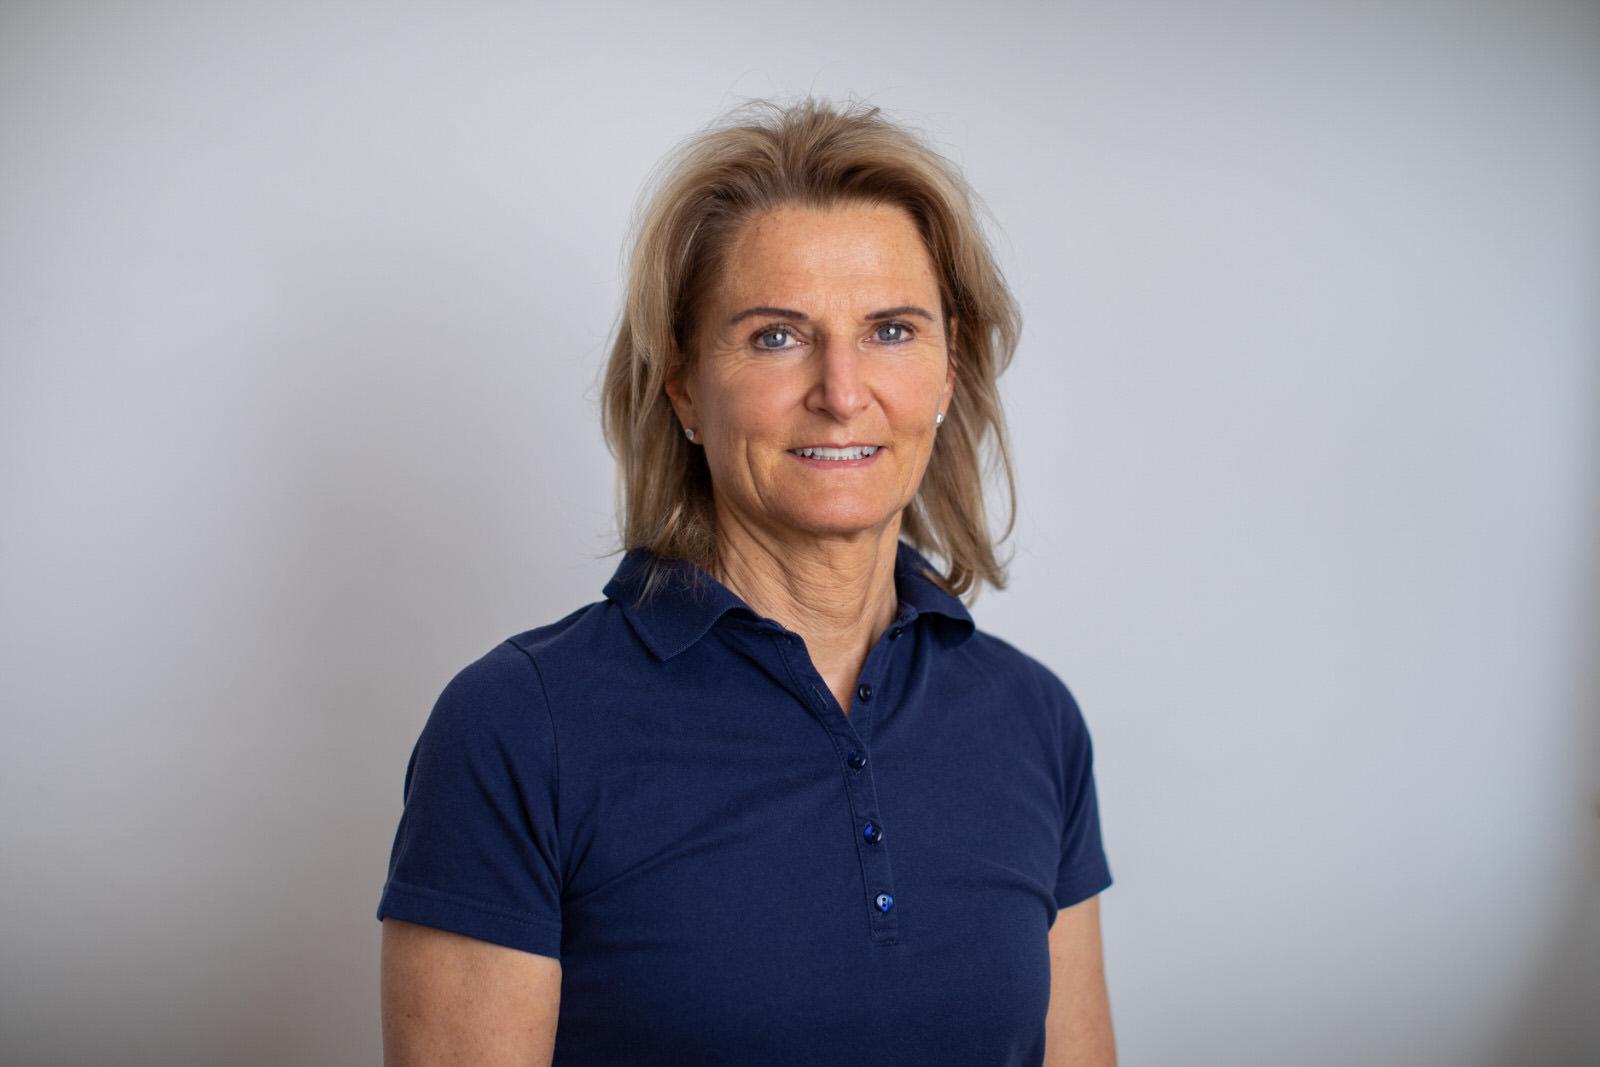 Dr. Evelyn Mayr